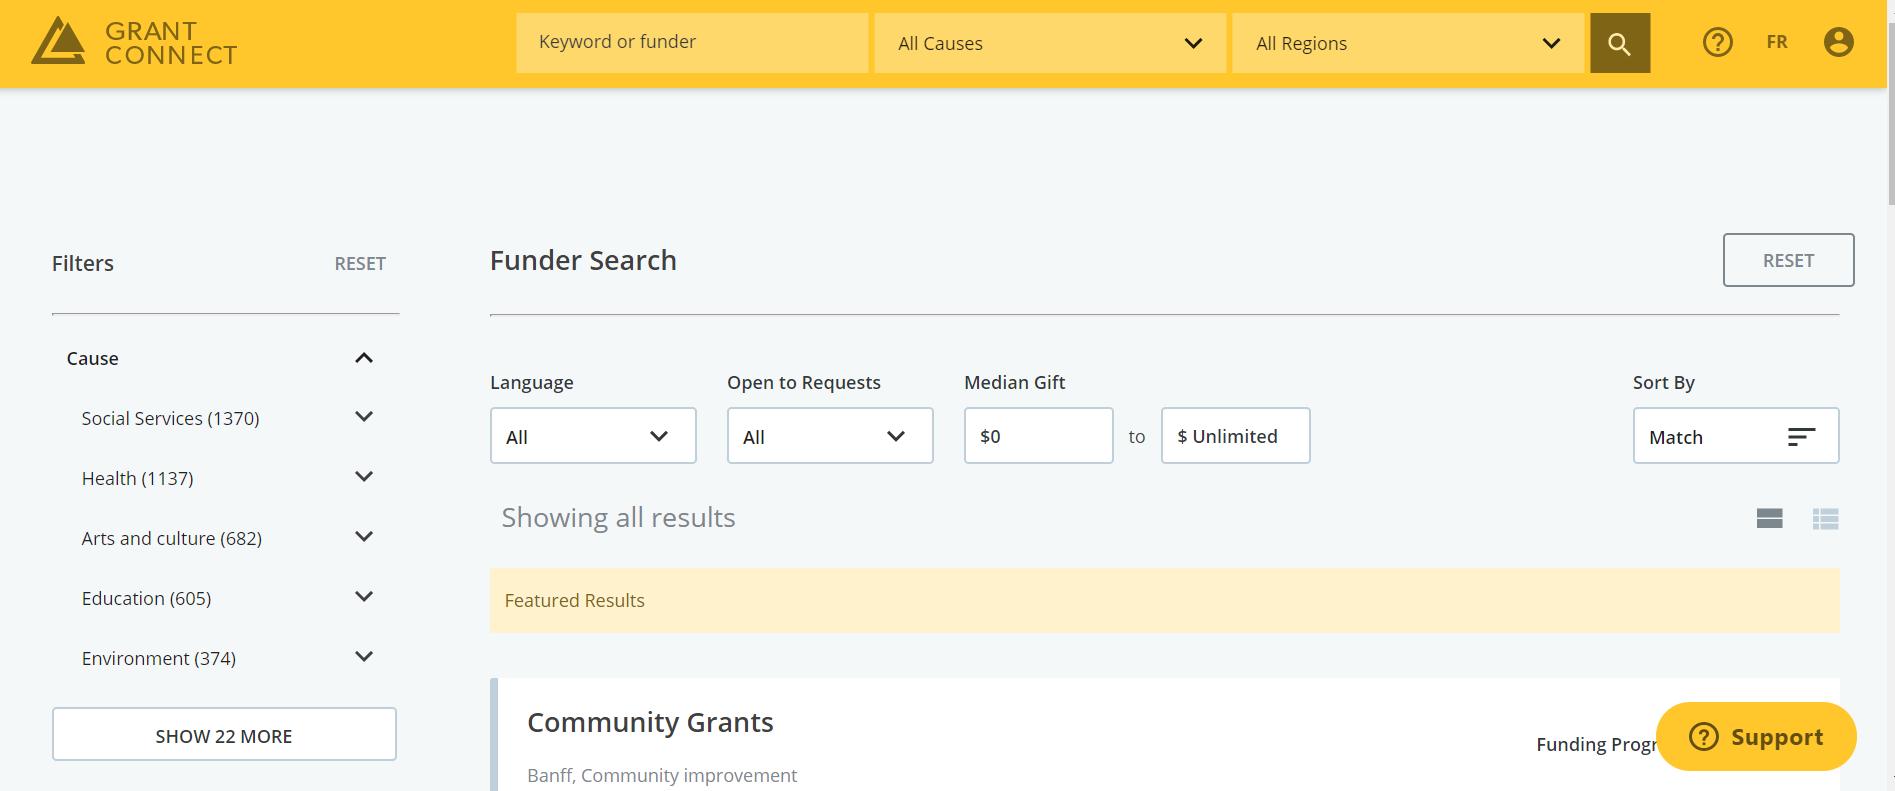 Grant Connect Screenshot